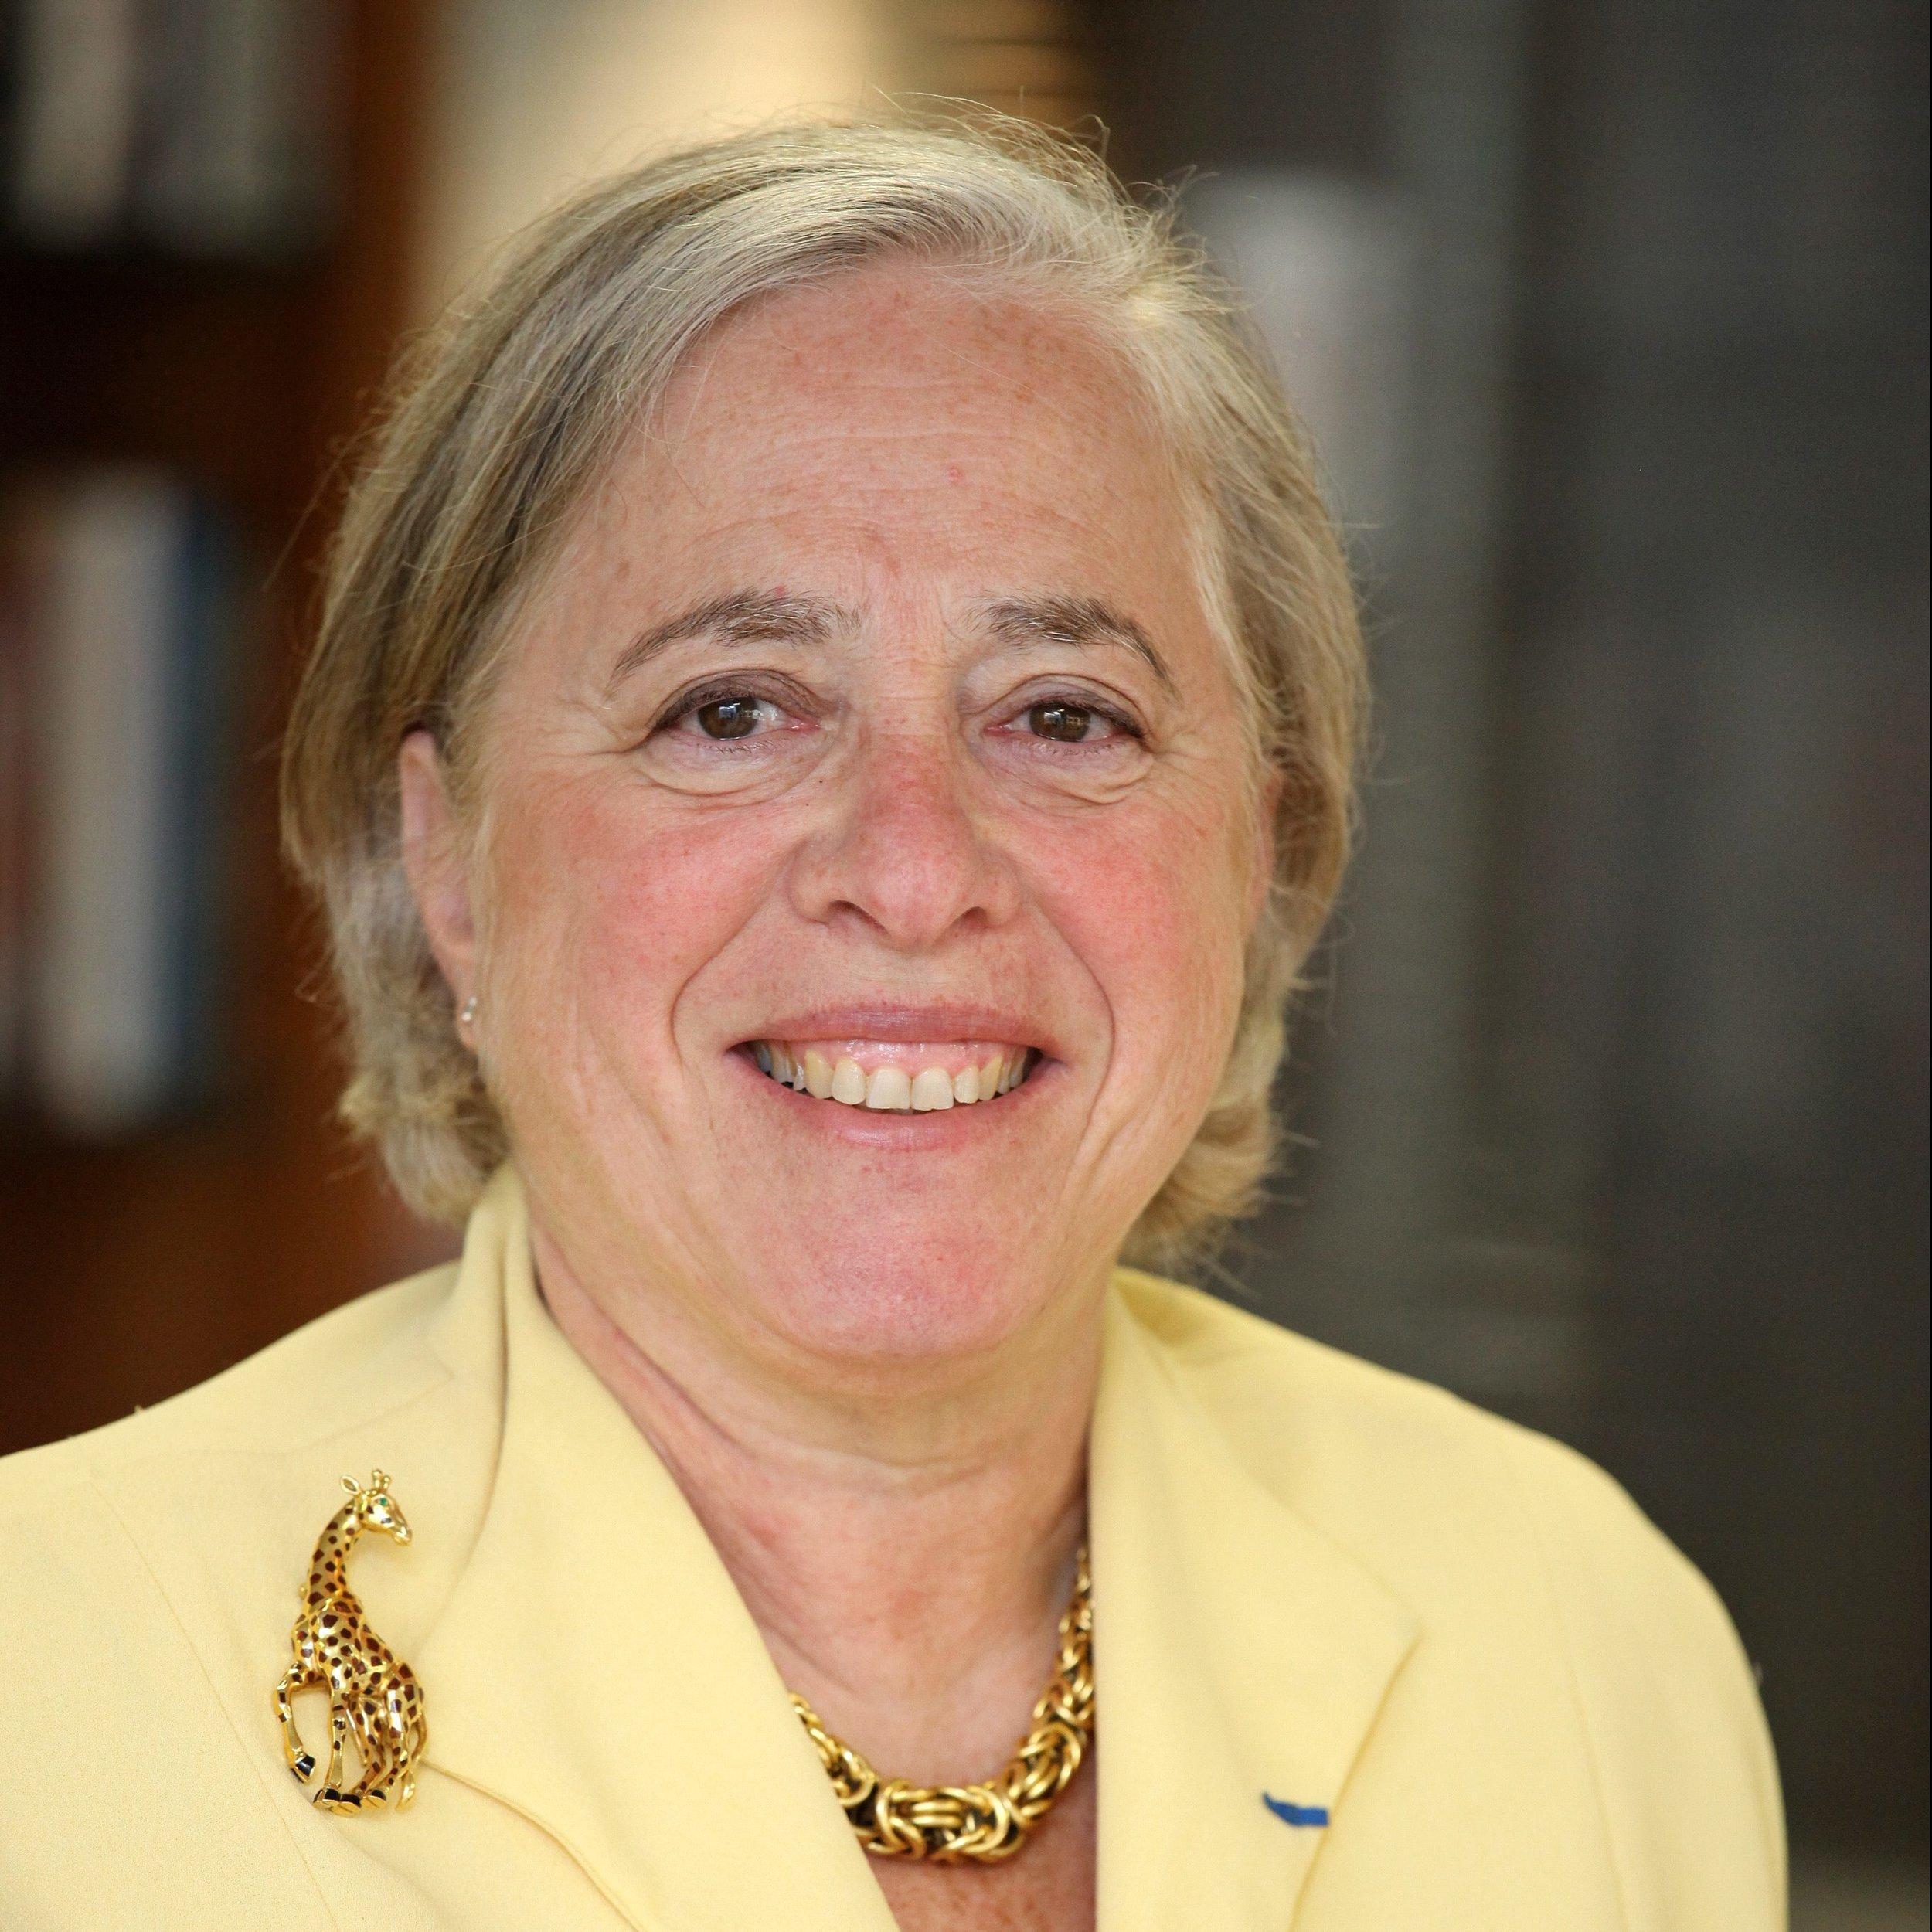 Béatrice Philippe - PresidentFOURPOINTS Asset Management (New York)